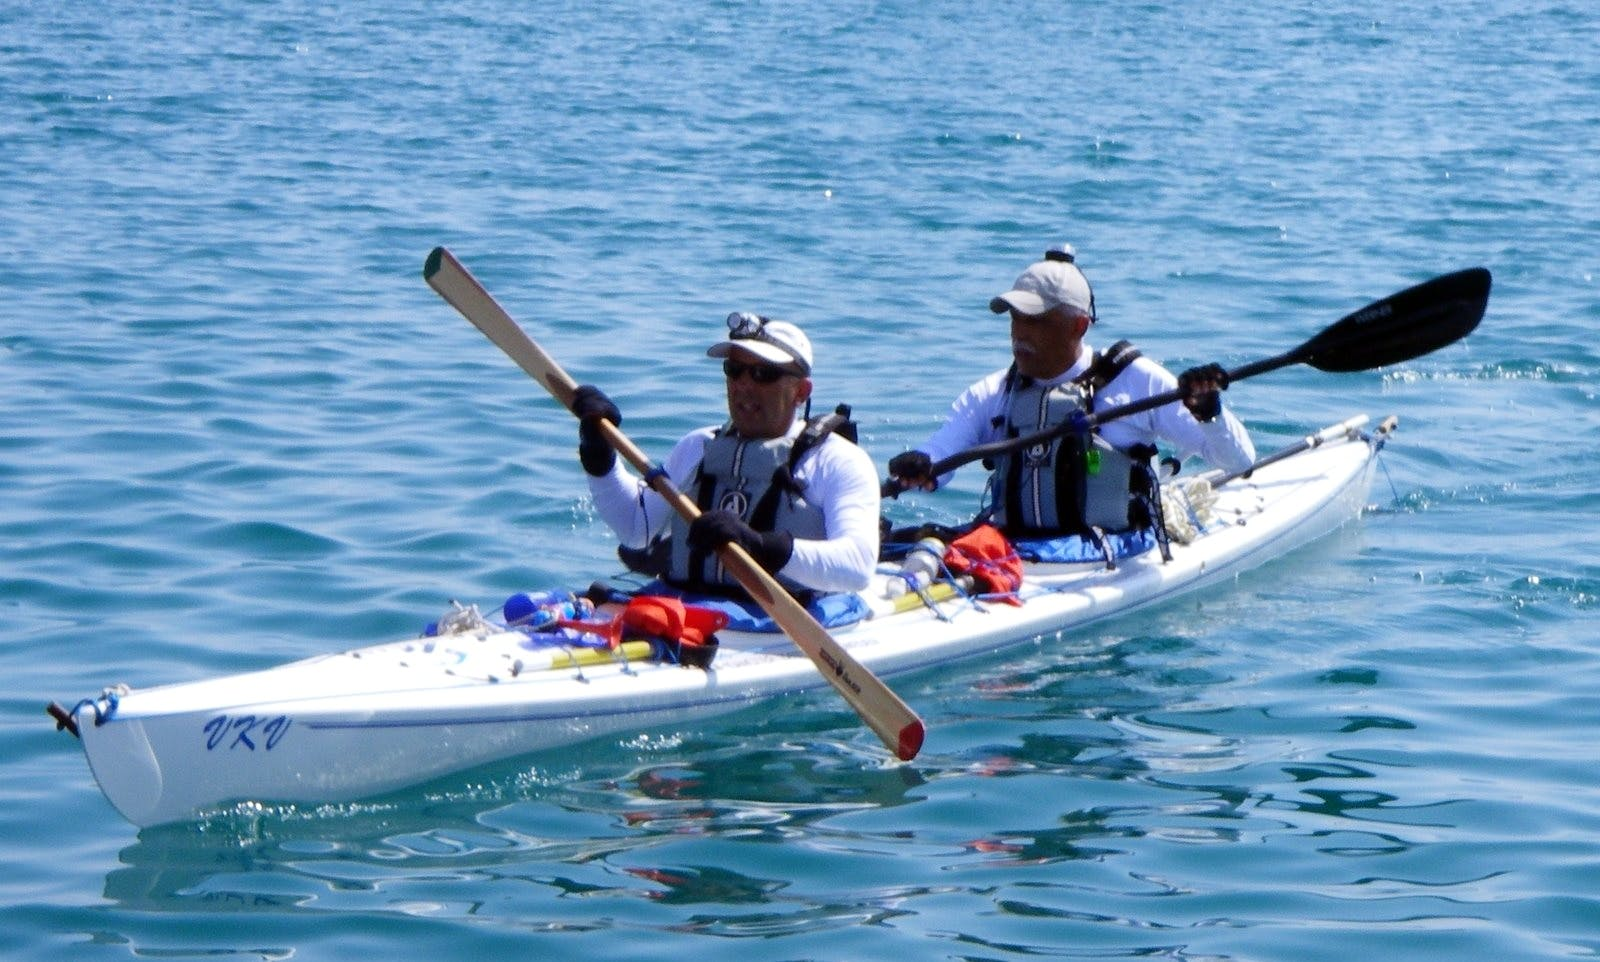 Kayak Rental in Craigleith